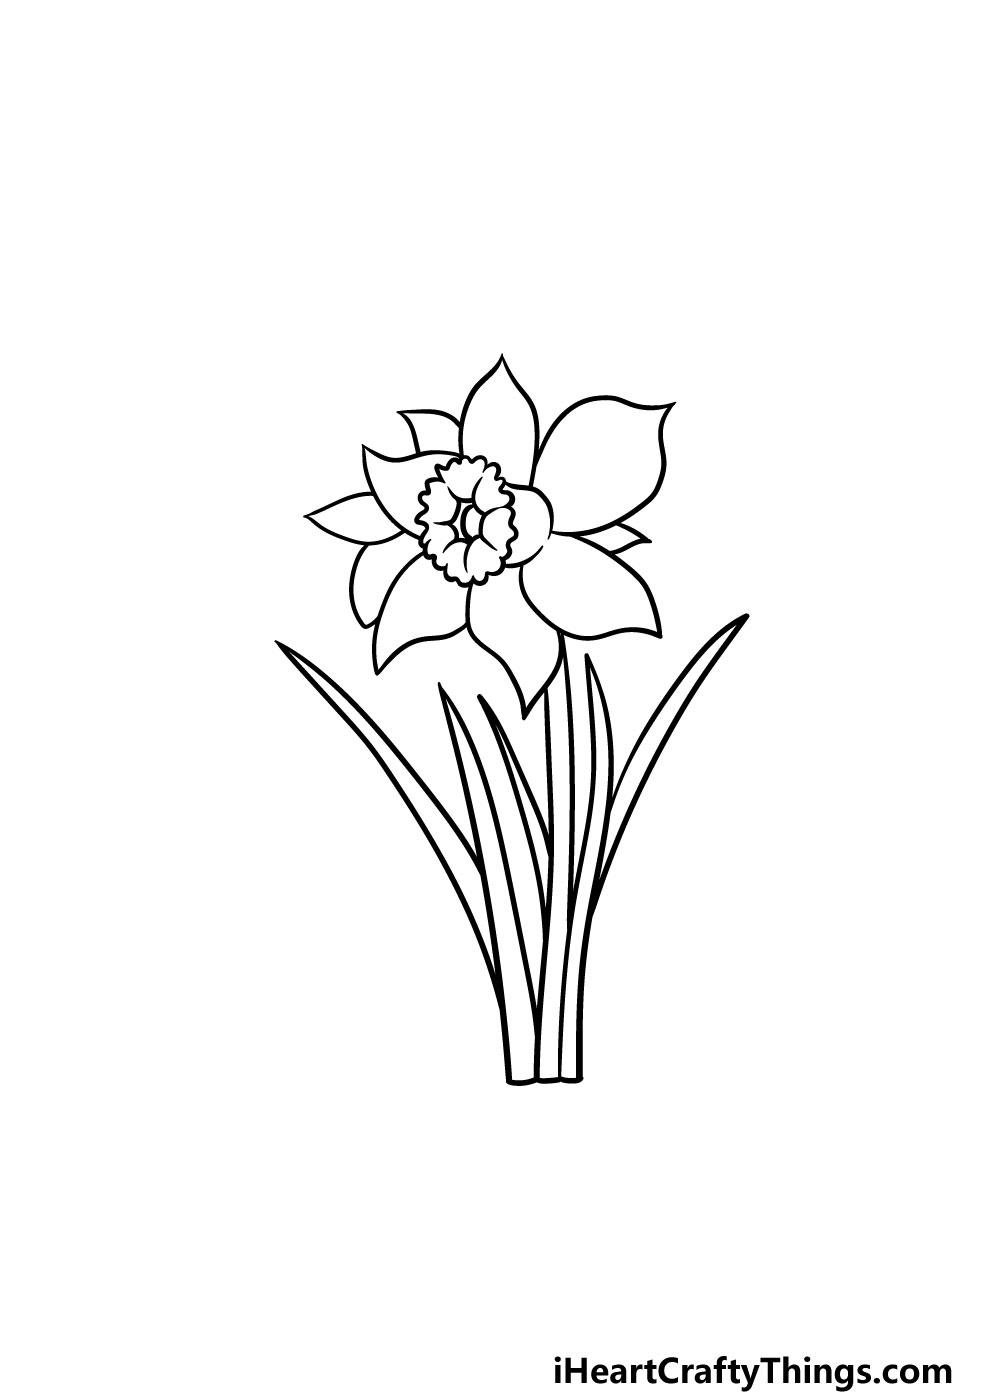 drawing a daffodil step 5